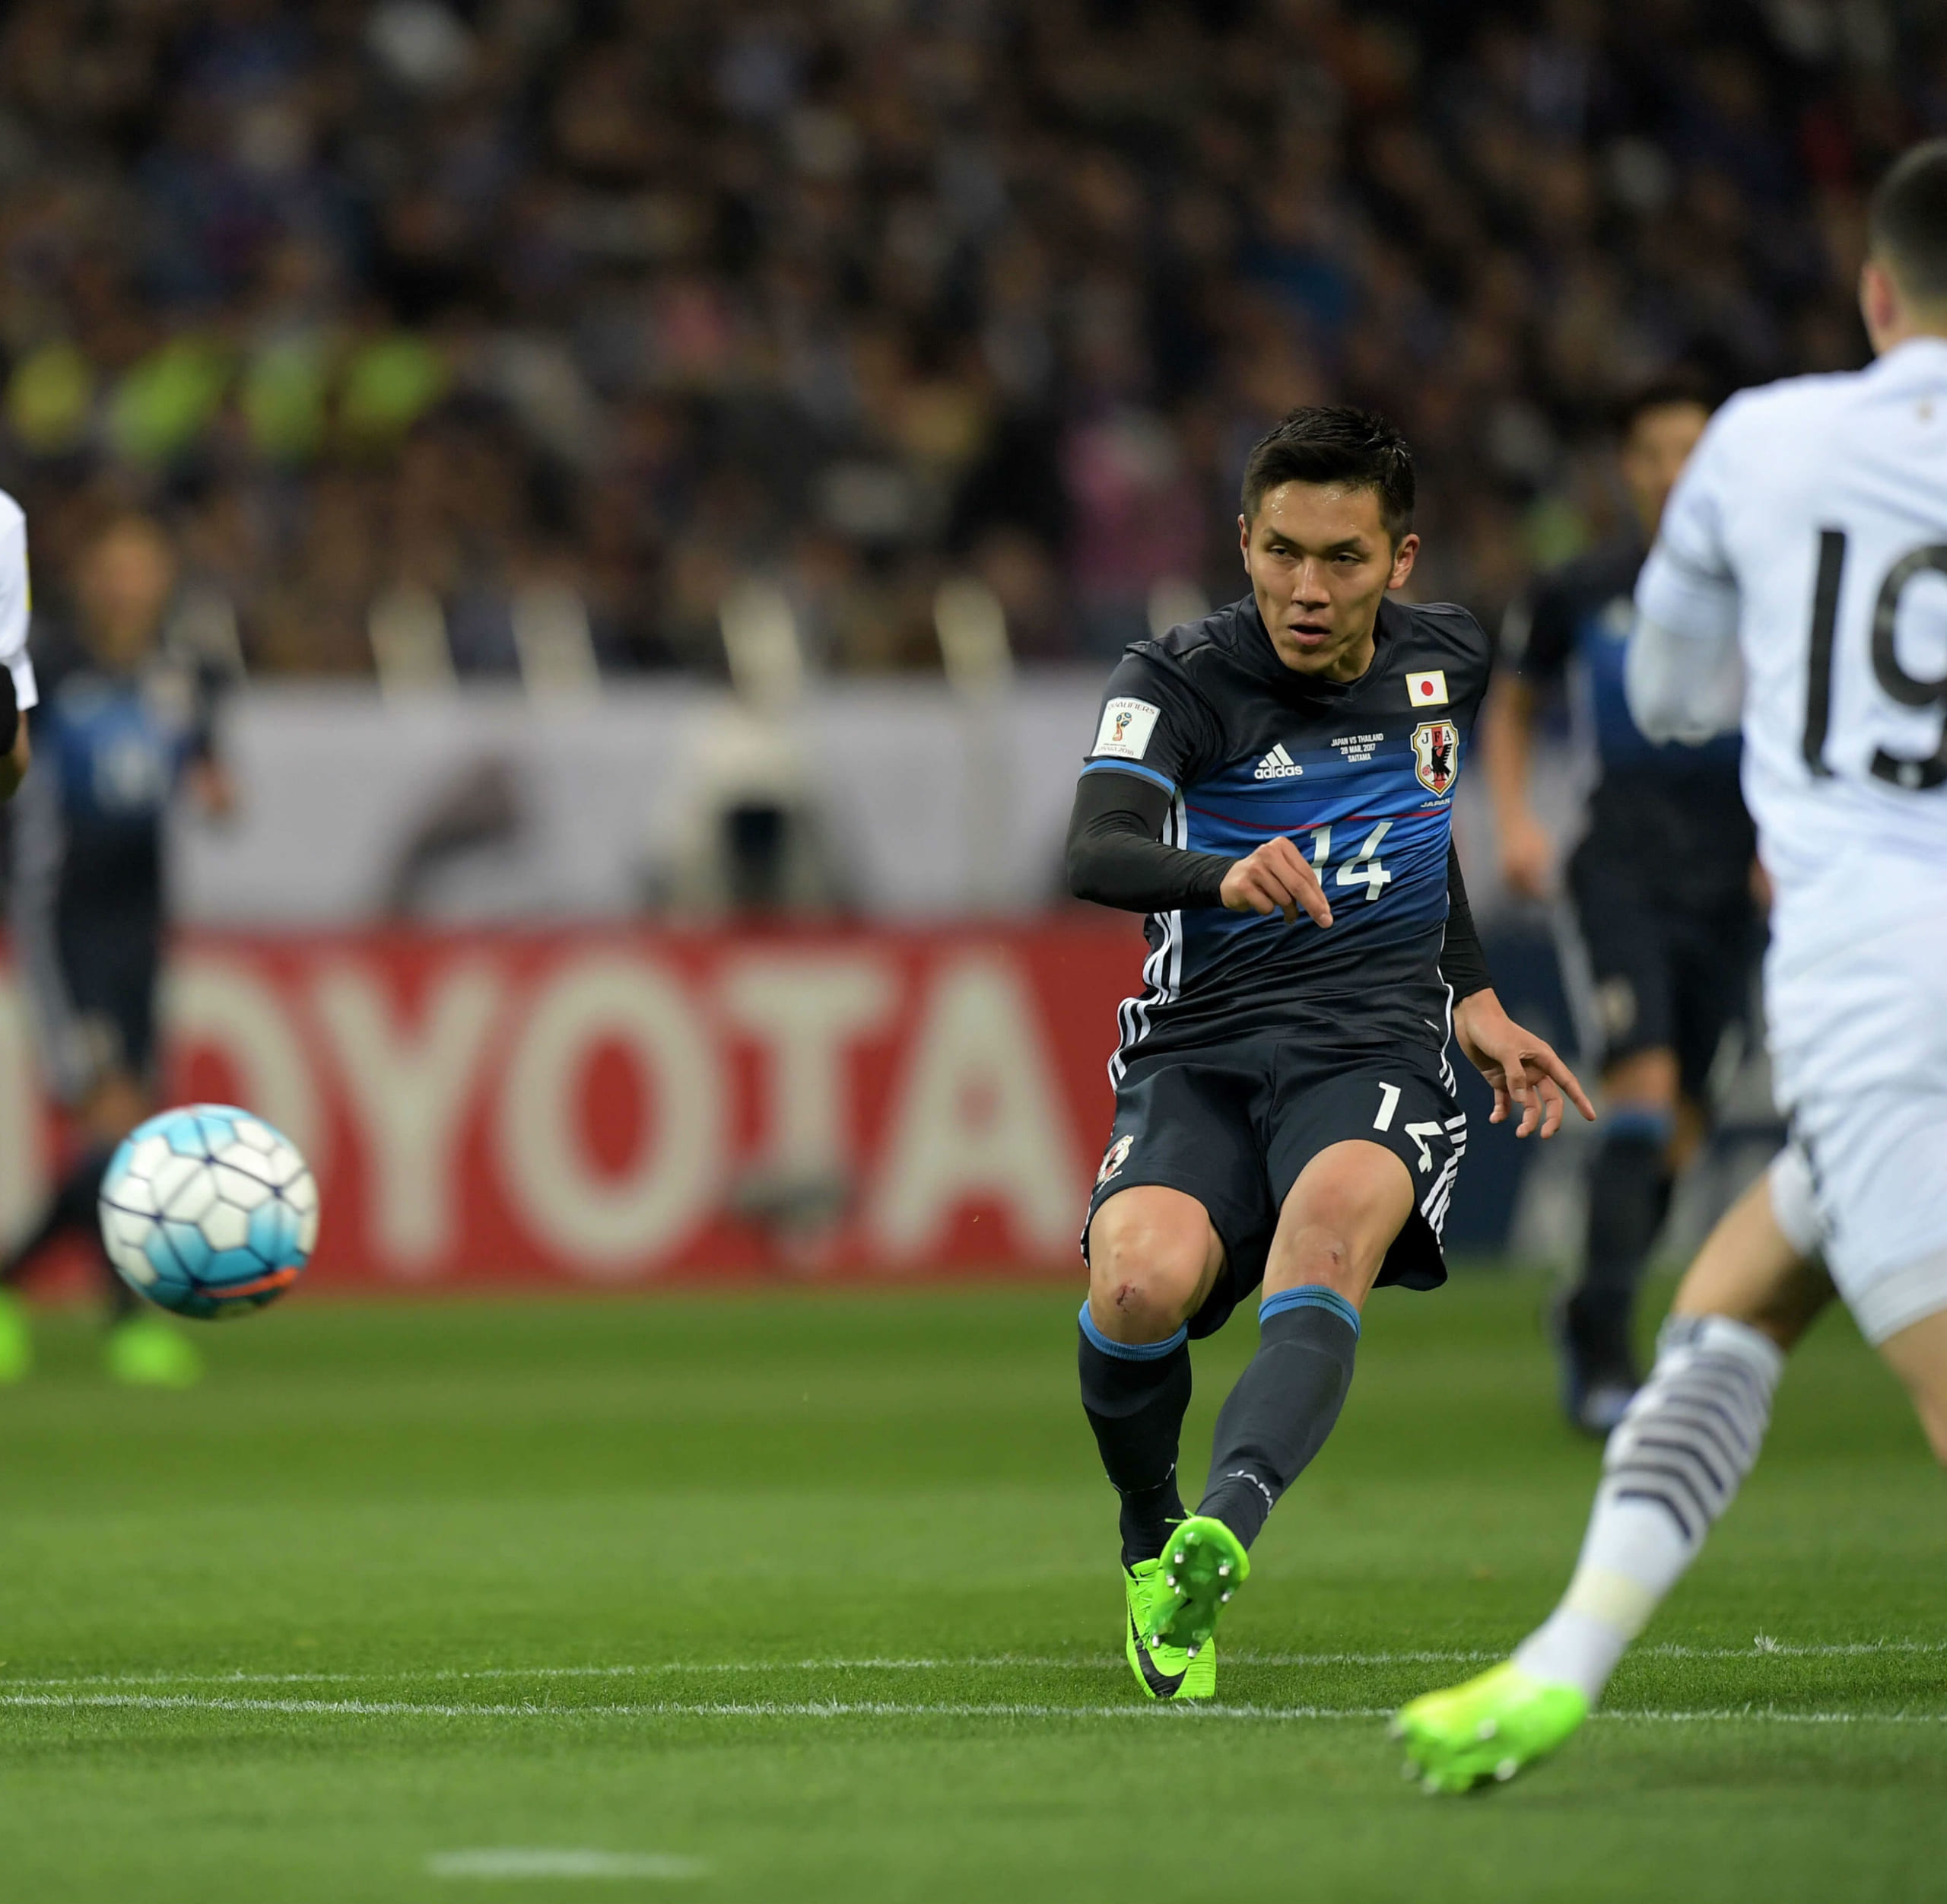 W杯アジア最終予選。日本代表にとって「結果と内容が一致していない試合」ではなかった【岩政大樹の現役目線】